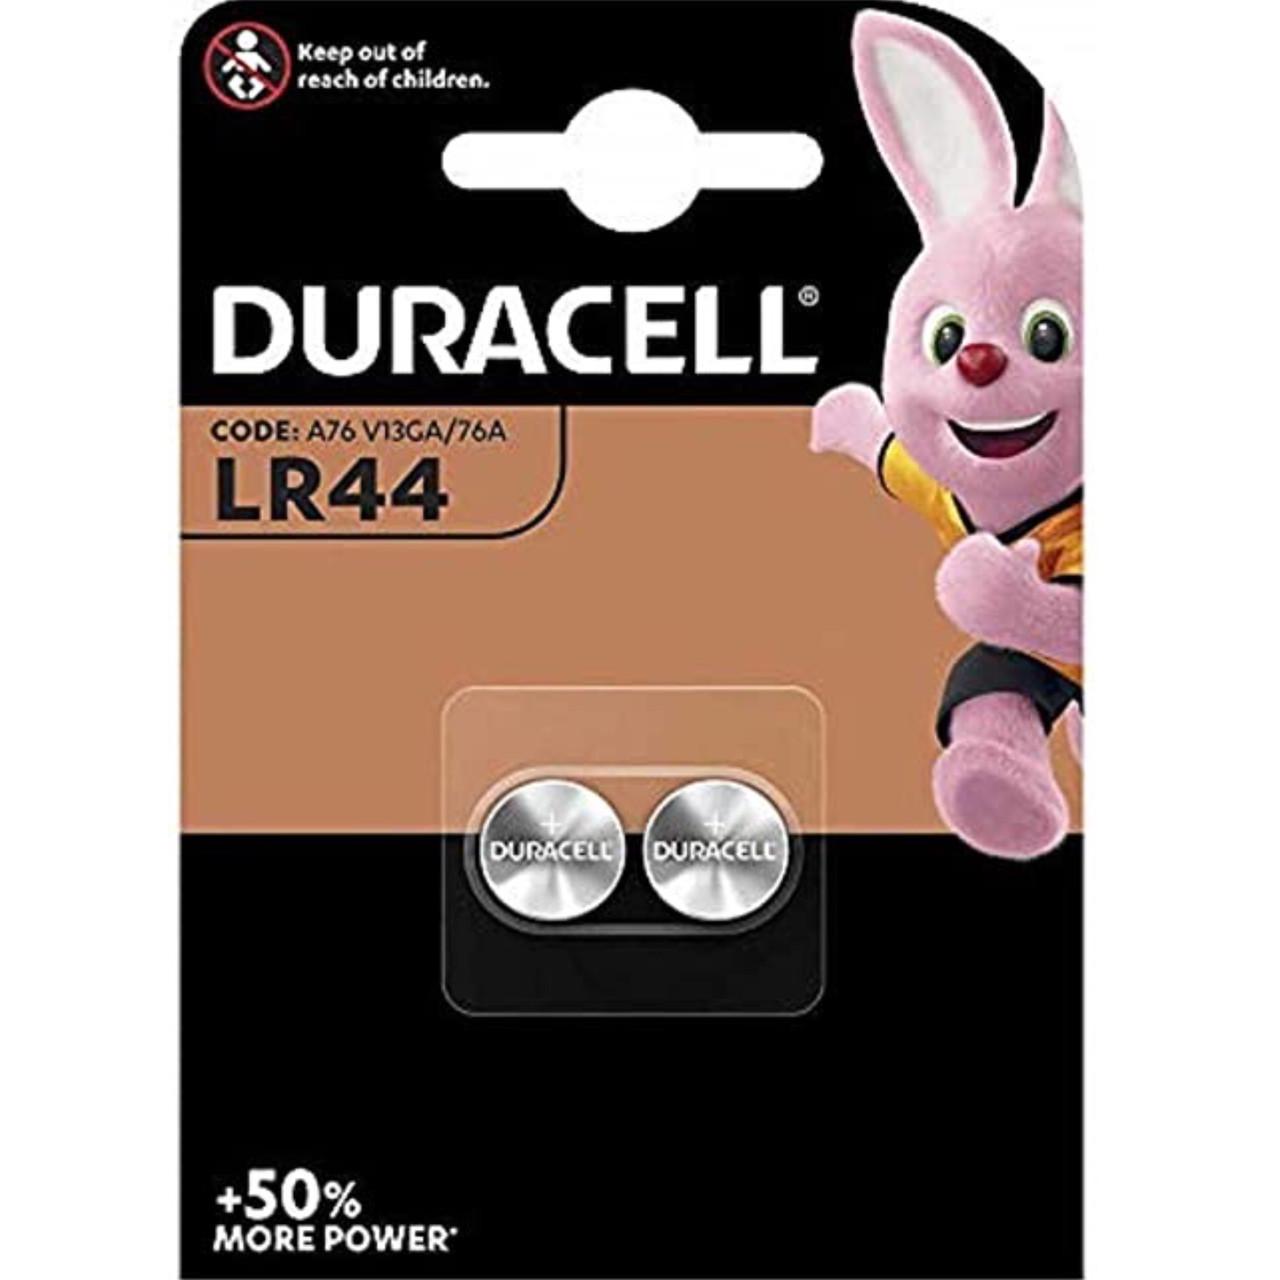 Батарейка Duracell LR44 1.5V, 2шт - фото 1